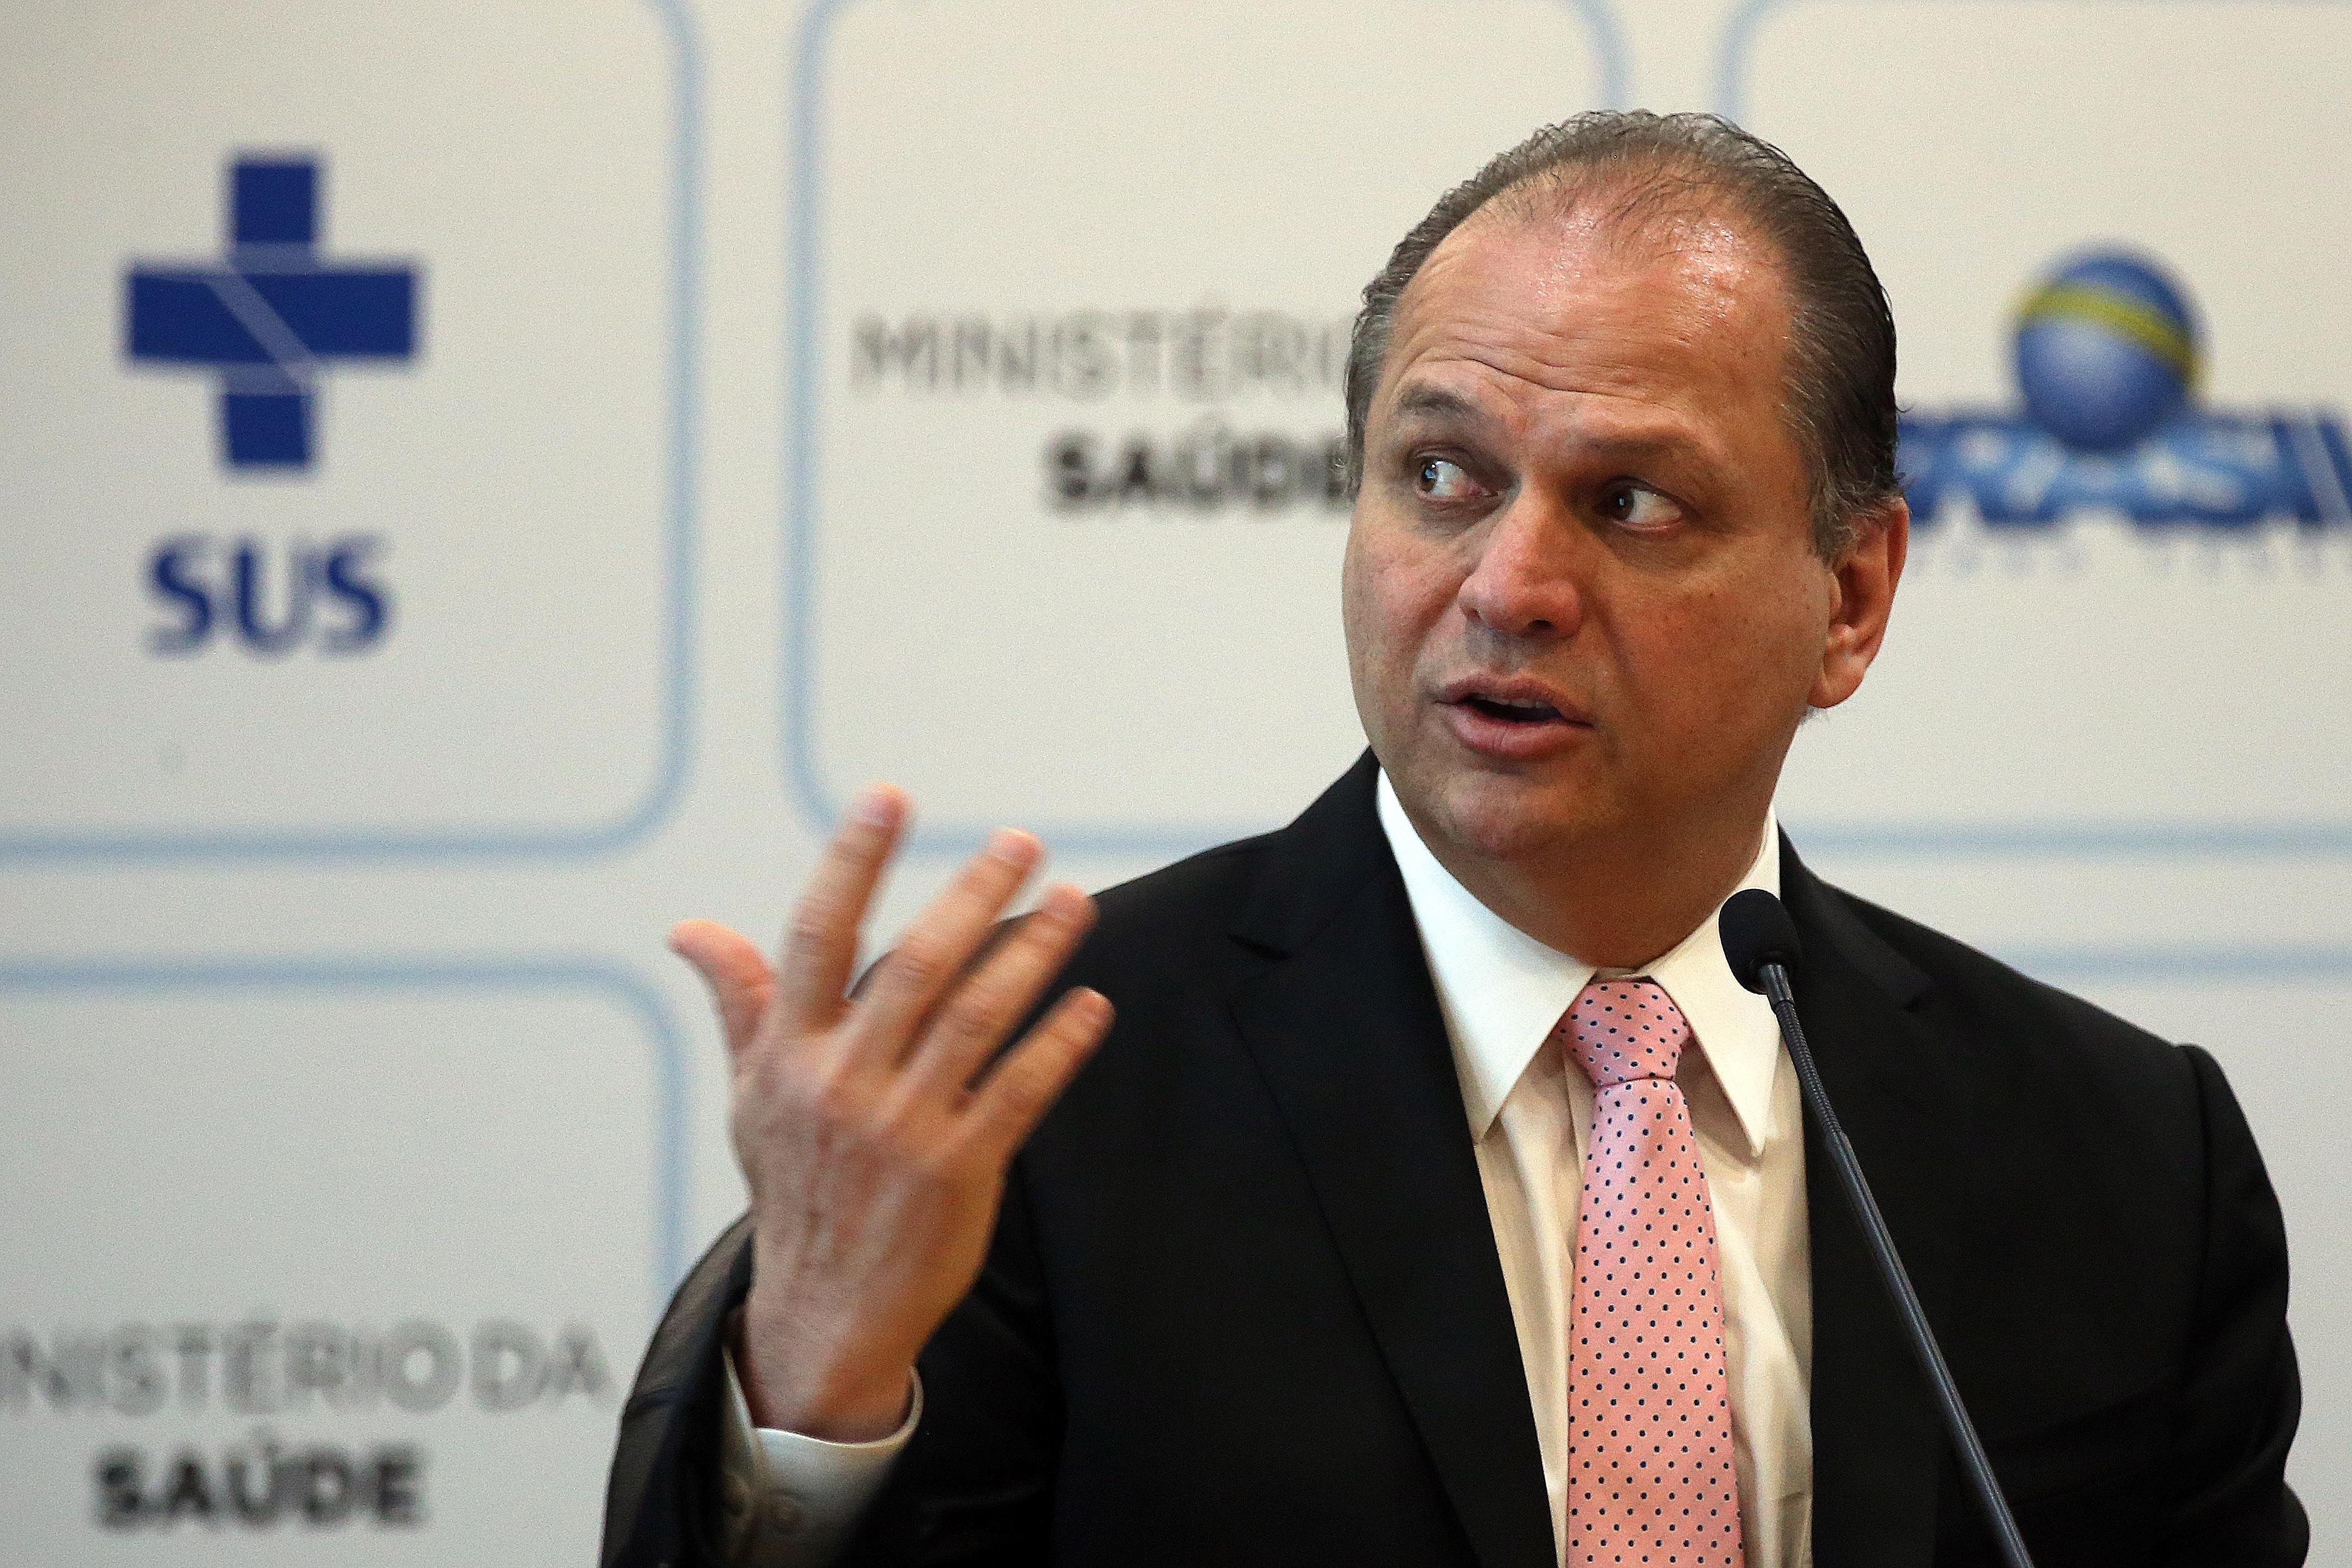 File:Ricardo Barros lança sistema para monitorar medicamentos  (37184191793).jpg - Wikimedia Commons